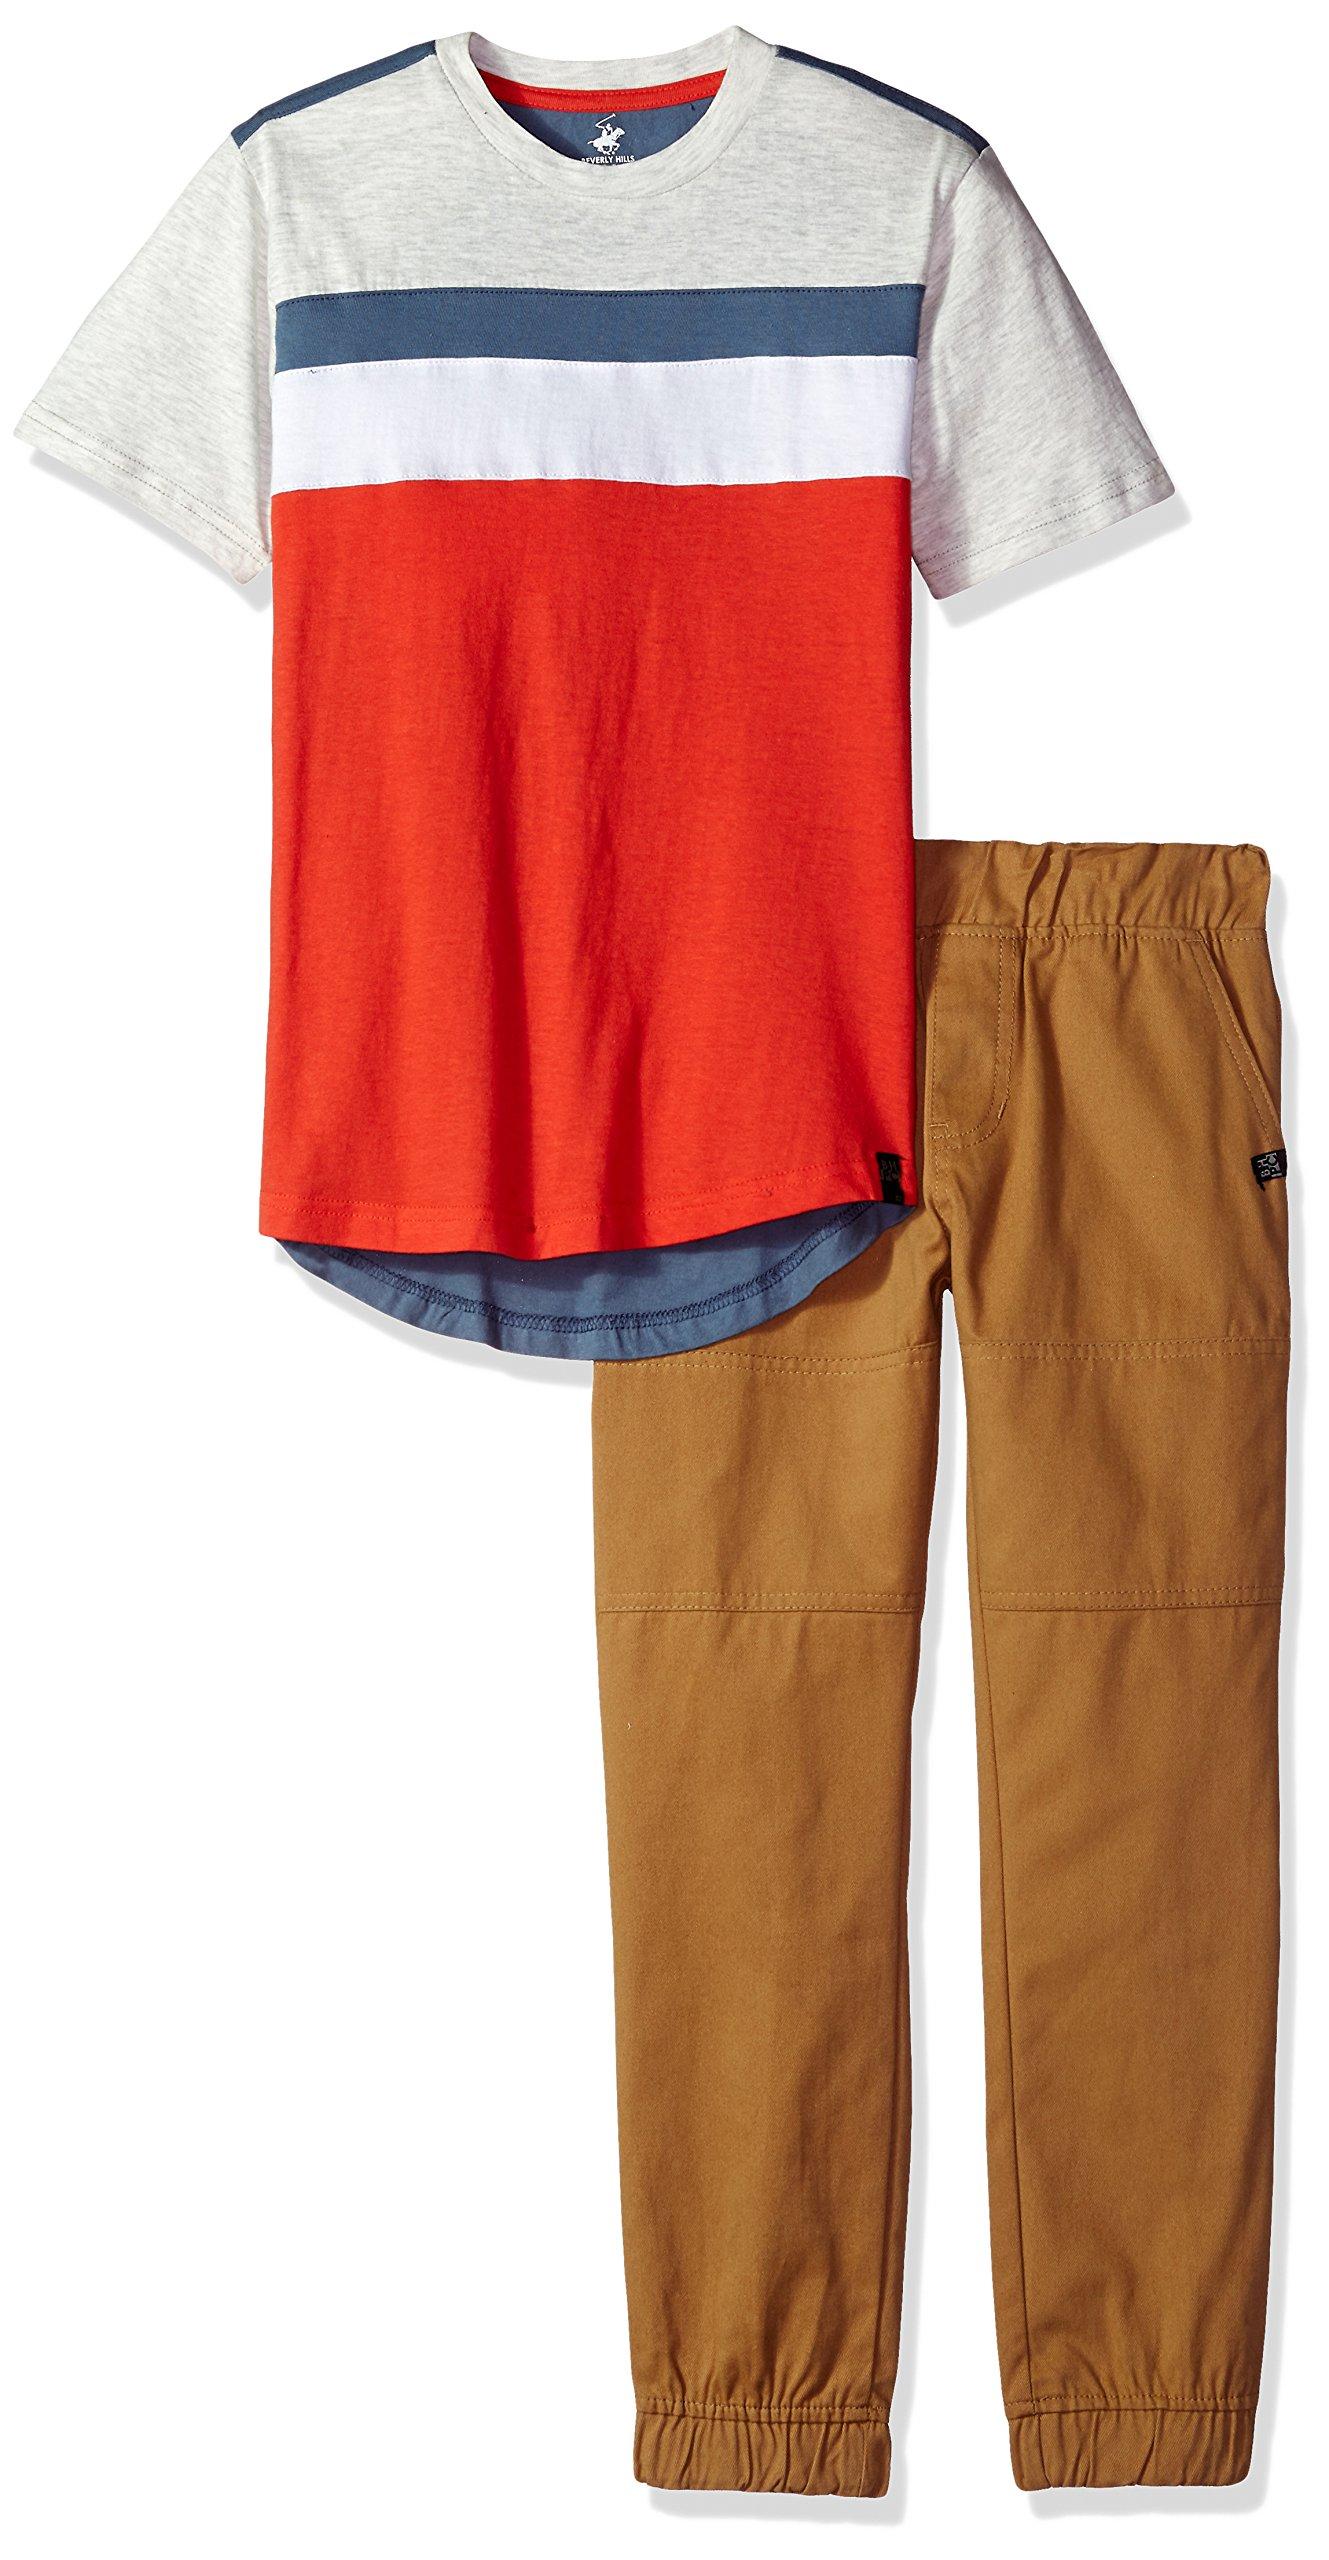 Beverly Hills Polo Club Boys' Toddler Short Sleeve